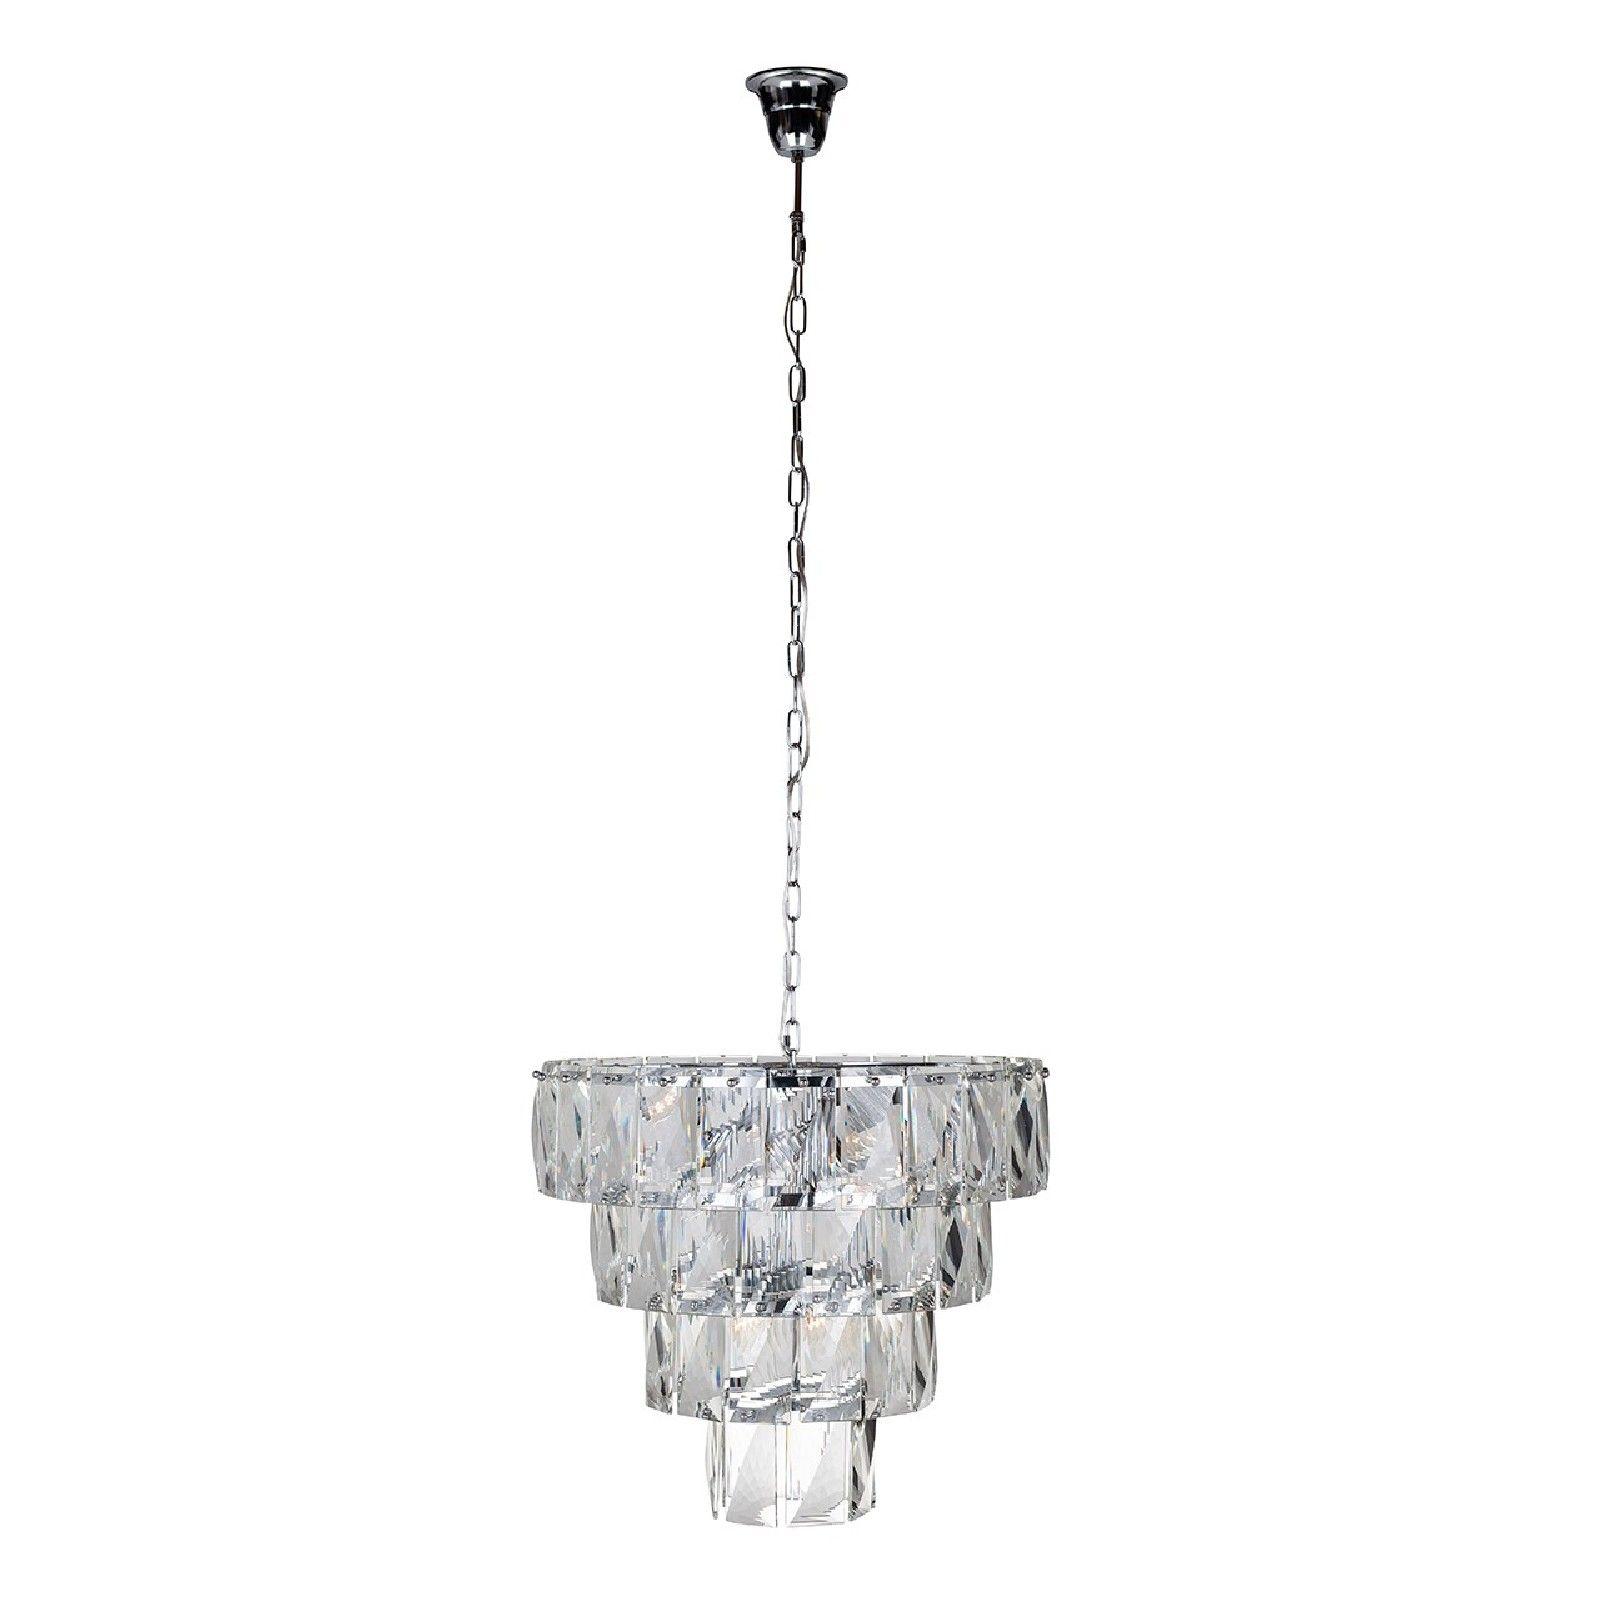 Lampe suspendue WyneE14 / 25 watts (9 pieces) Suspensions et plafonniers - 12